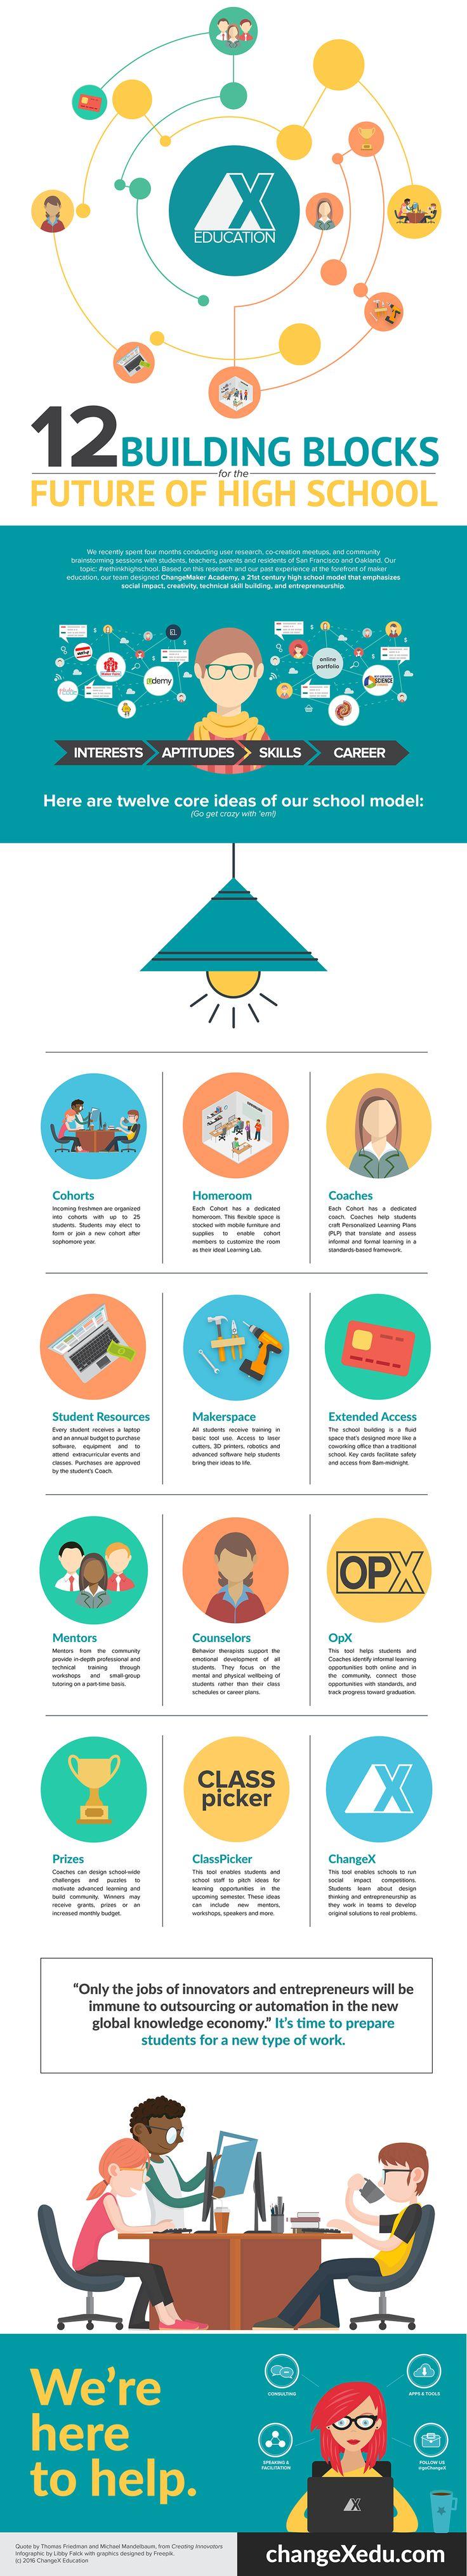 1664 best Education & 21st Century Skills images on Pinterest | 21st ...